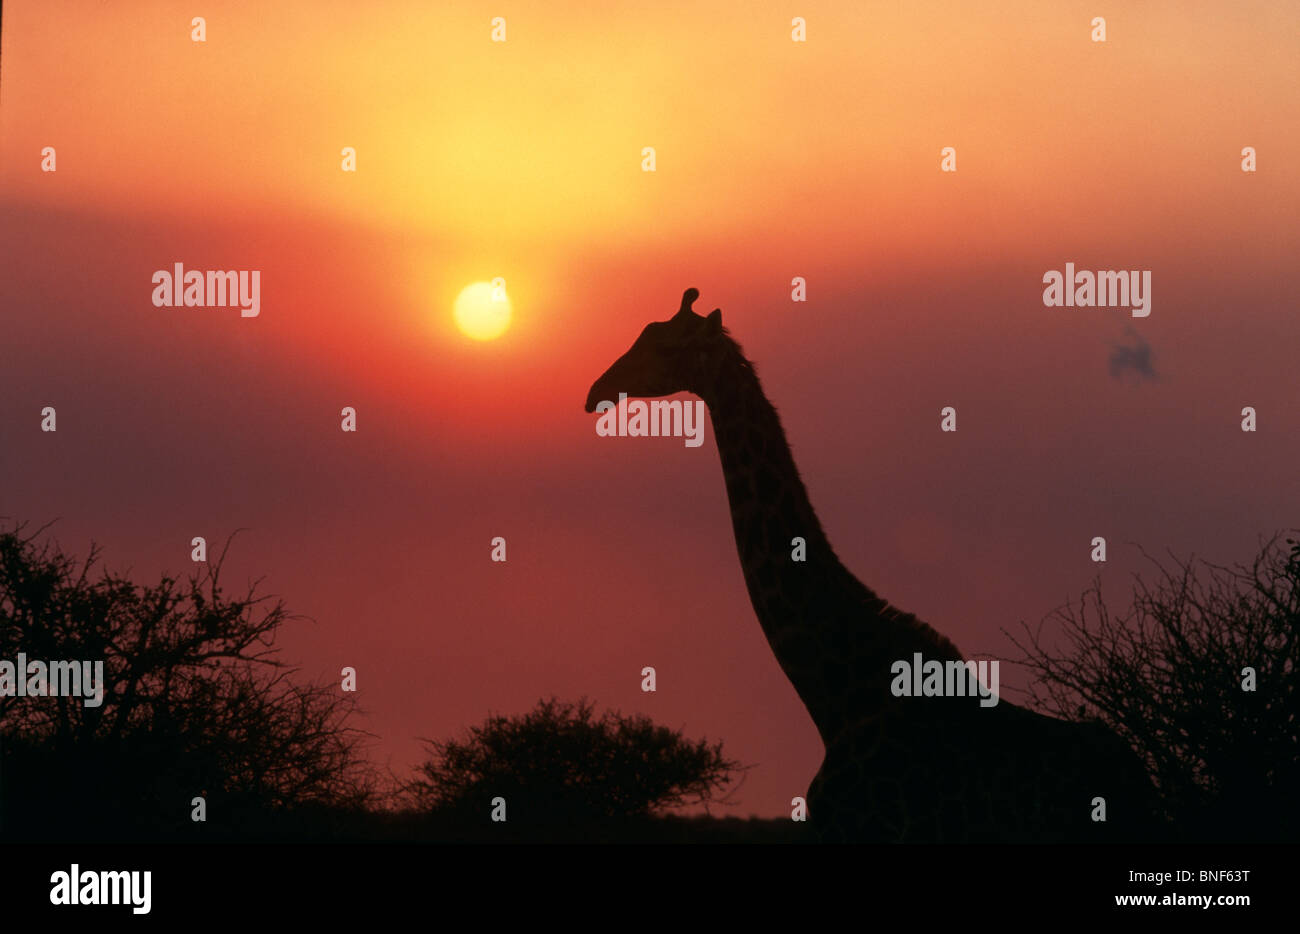 Silhouette de Girafe (Giraffa camelopardalis) contre le coucher du soleil, de la province de KwaZulu-Natal, Afrique Photo Stock